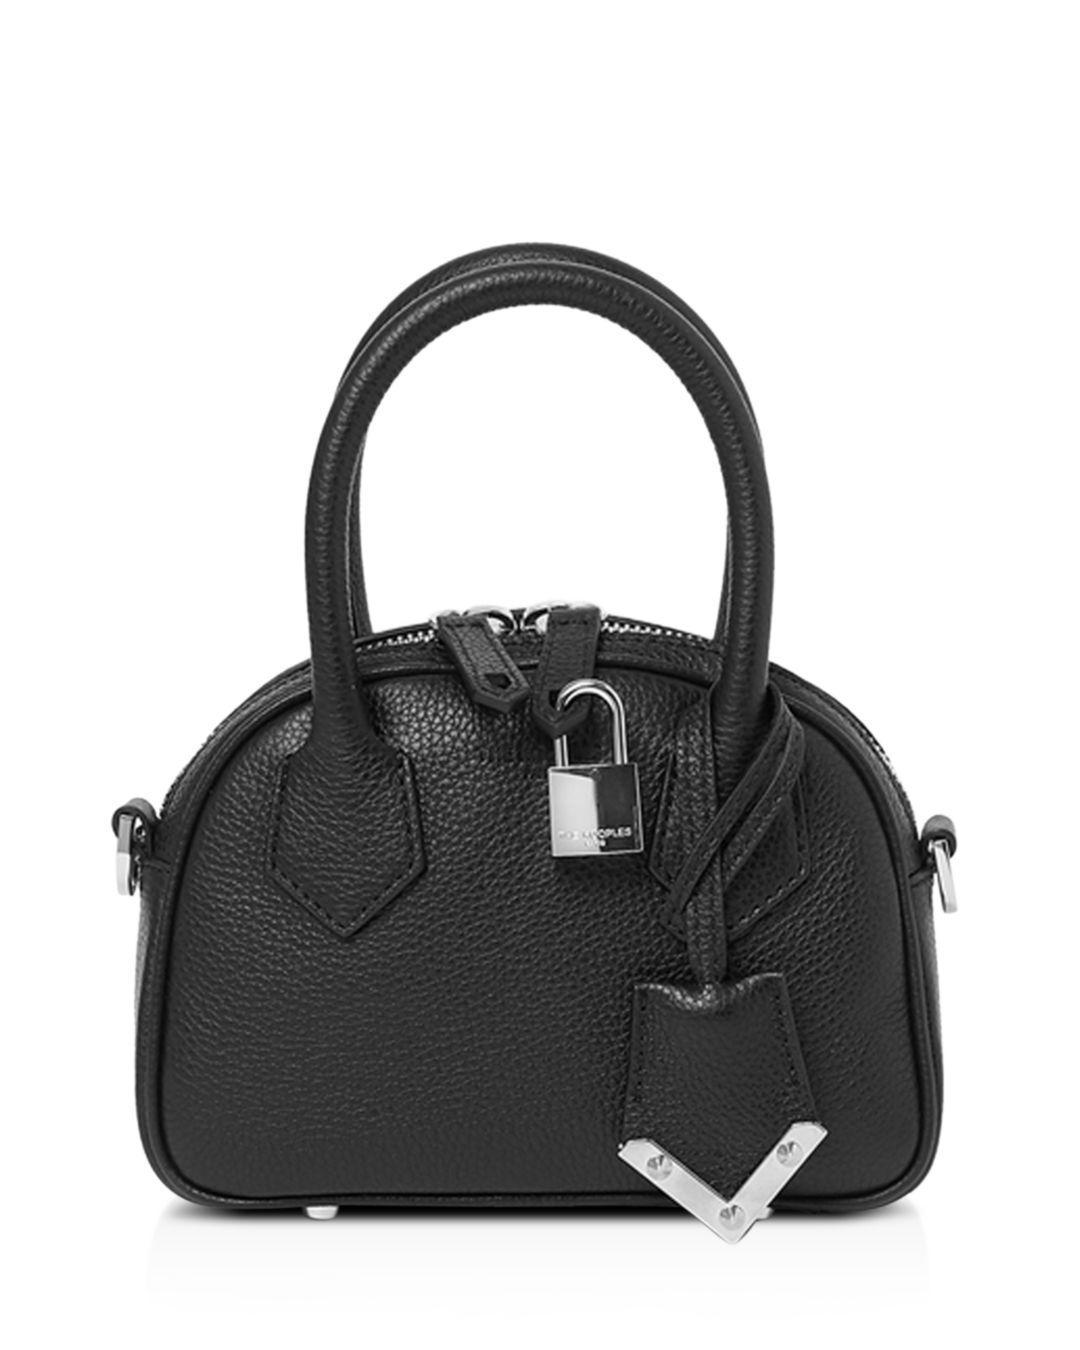 b0acb98239a6 The Kooples Irina Mini Leather Crossbody Bag in Black - Lyst